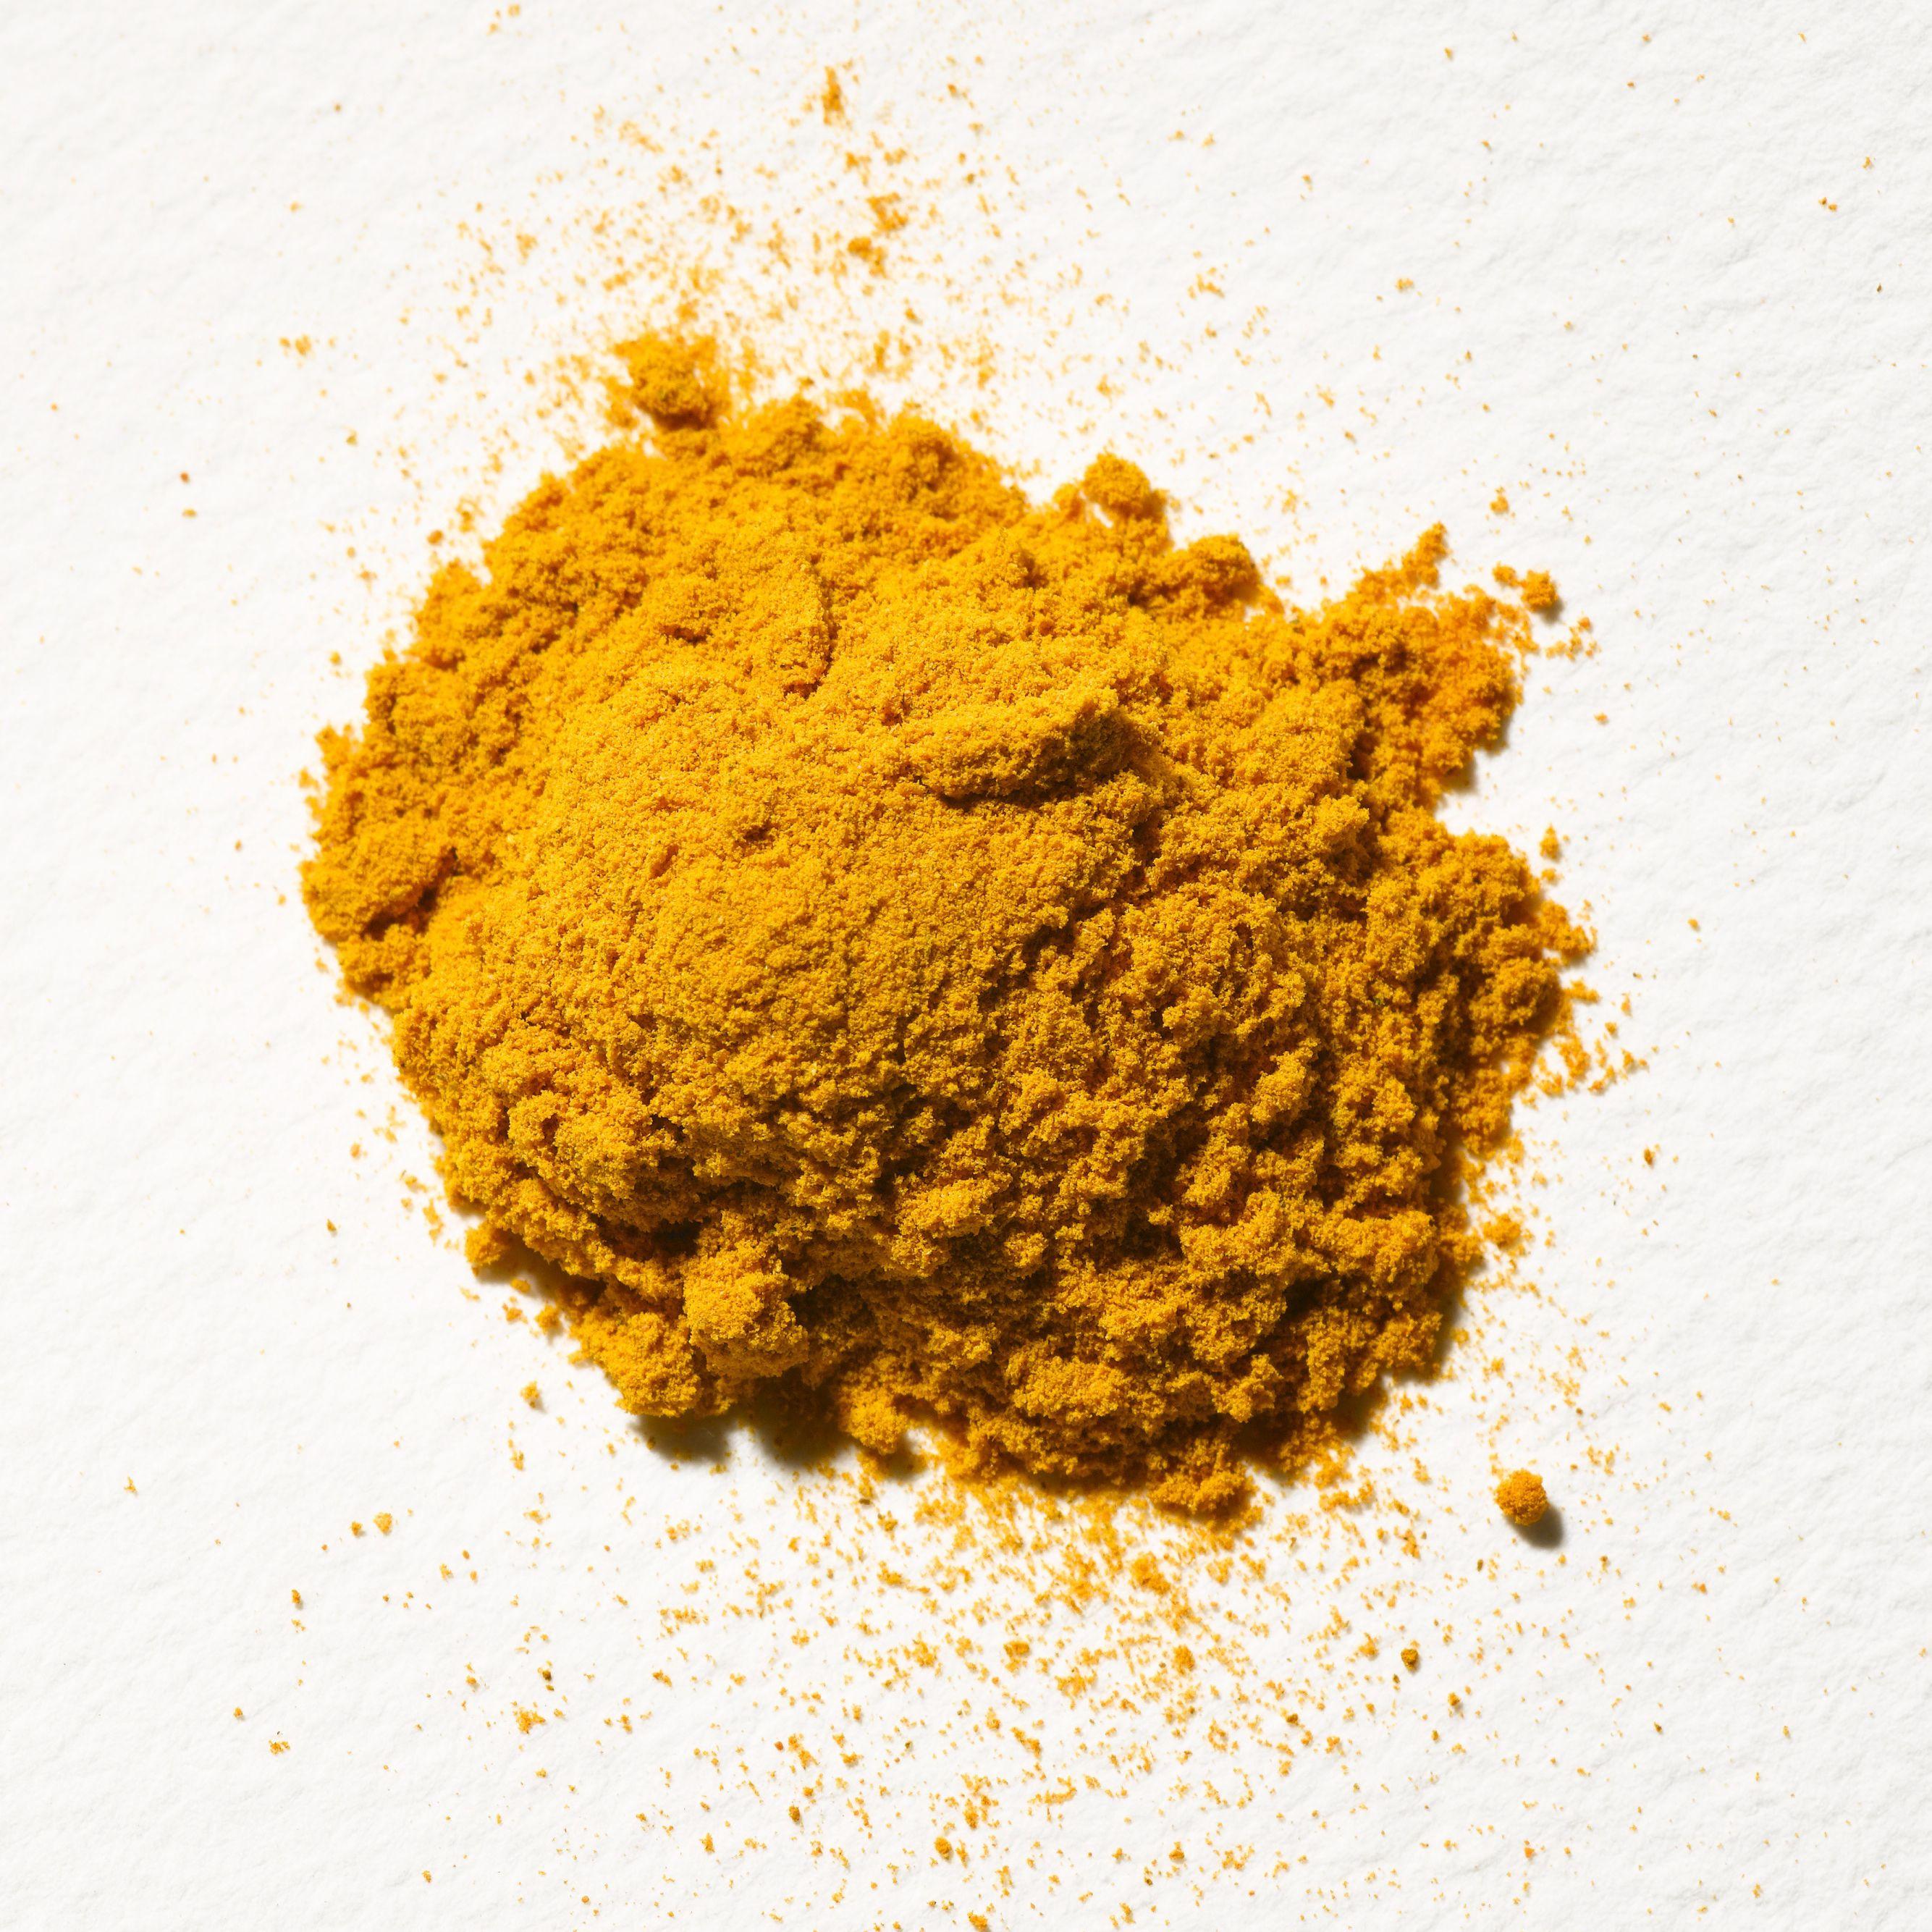 Skin Brightening Turmeric Face Mask Recipe